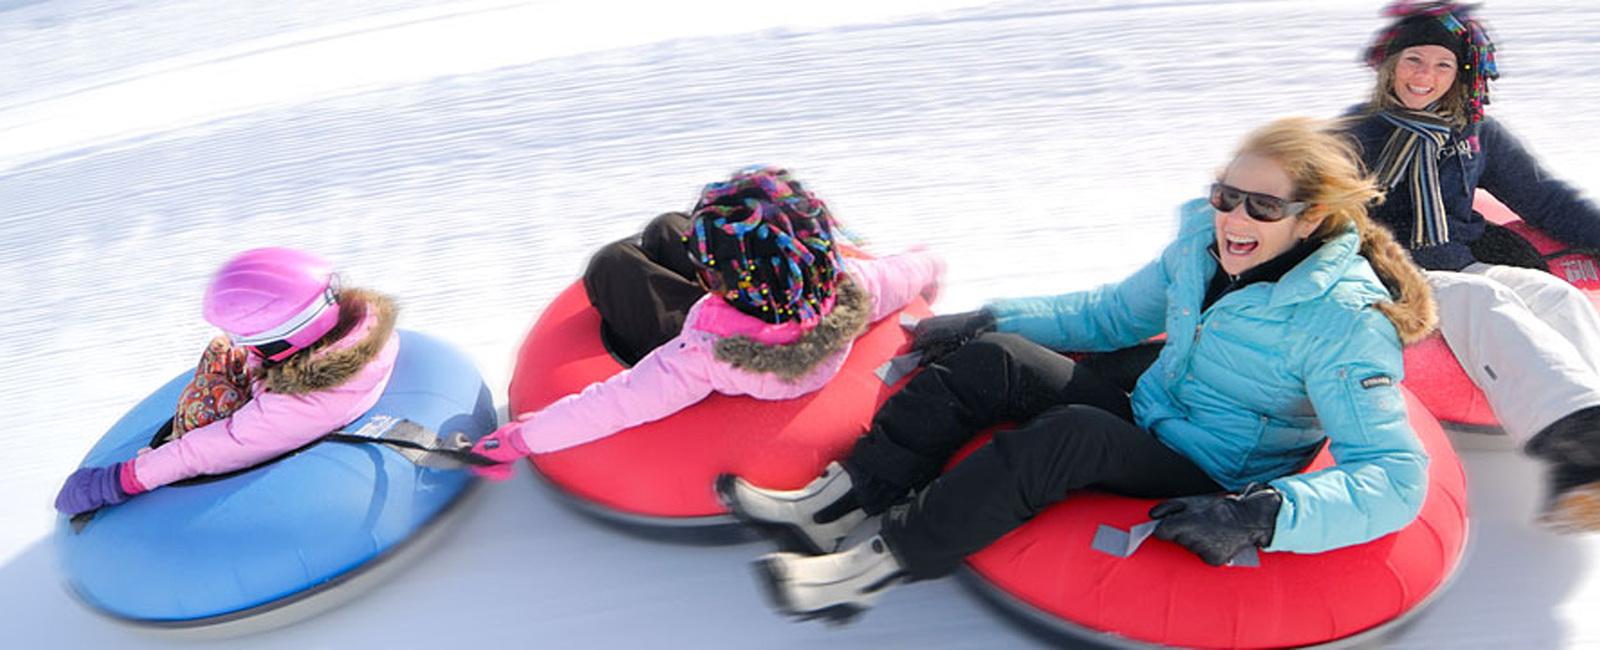 Snowbasin Scenic Gondola Rides